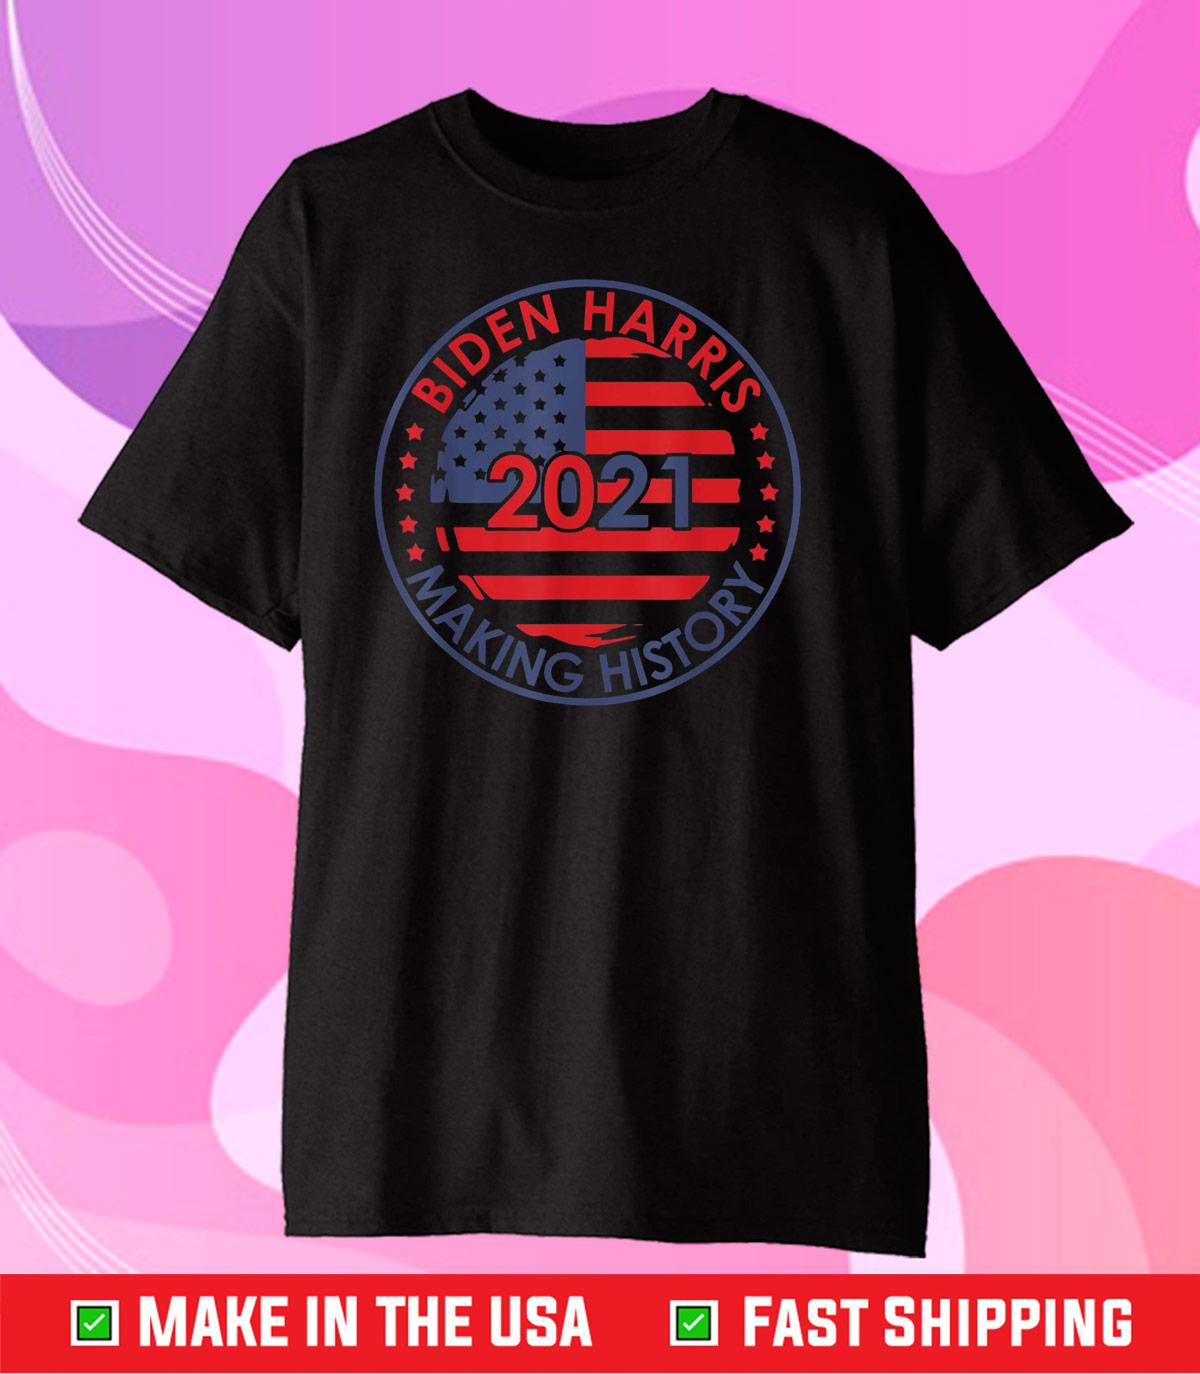 Biden Harris Inauguration 2021 Making History Retro Vintage Classic T-Shirt